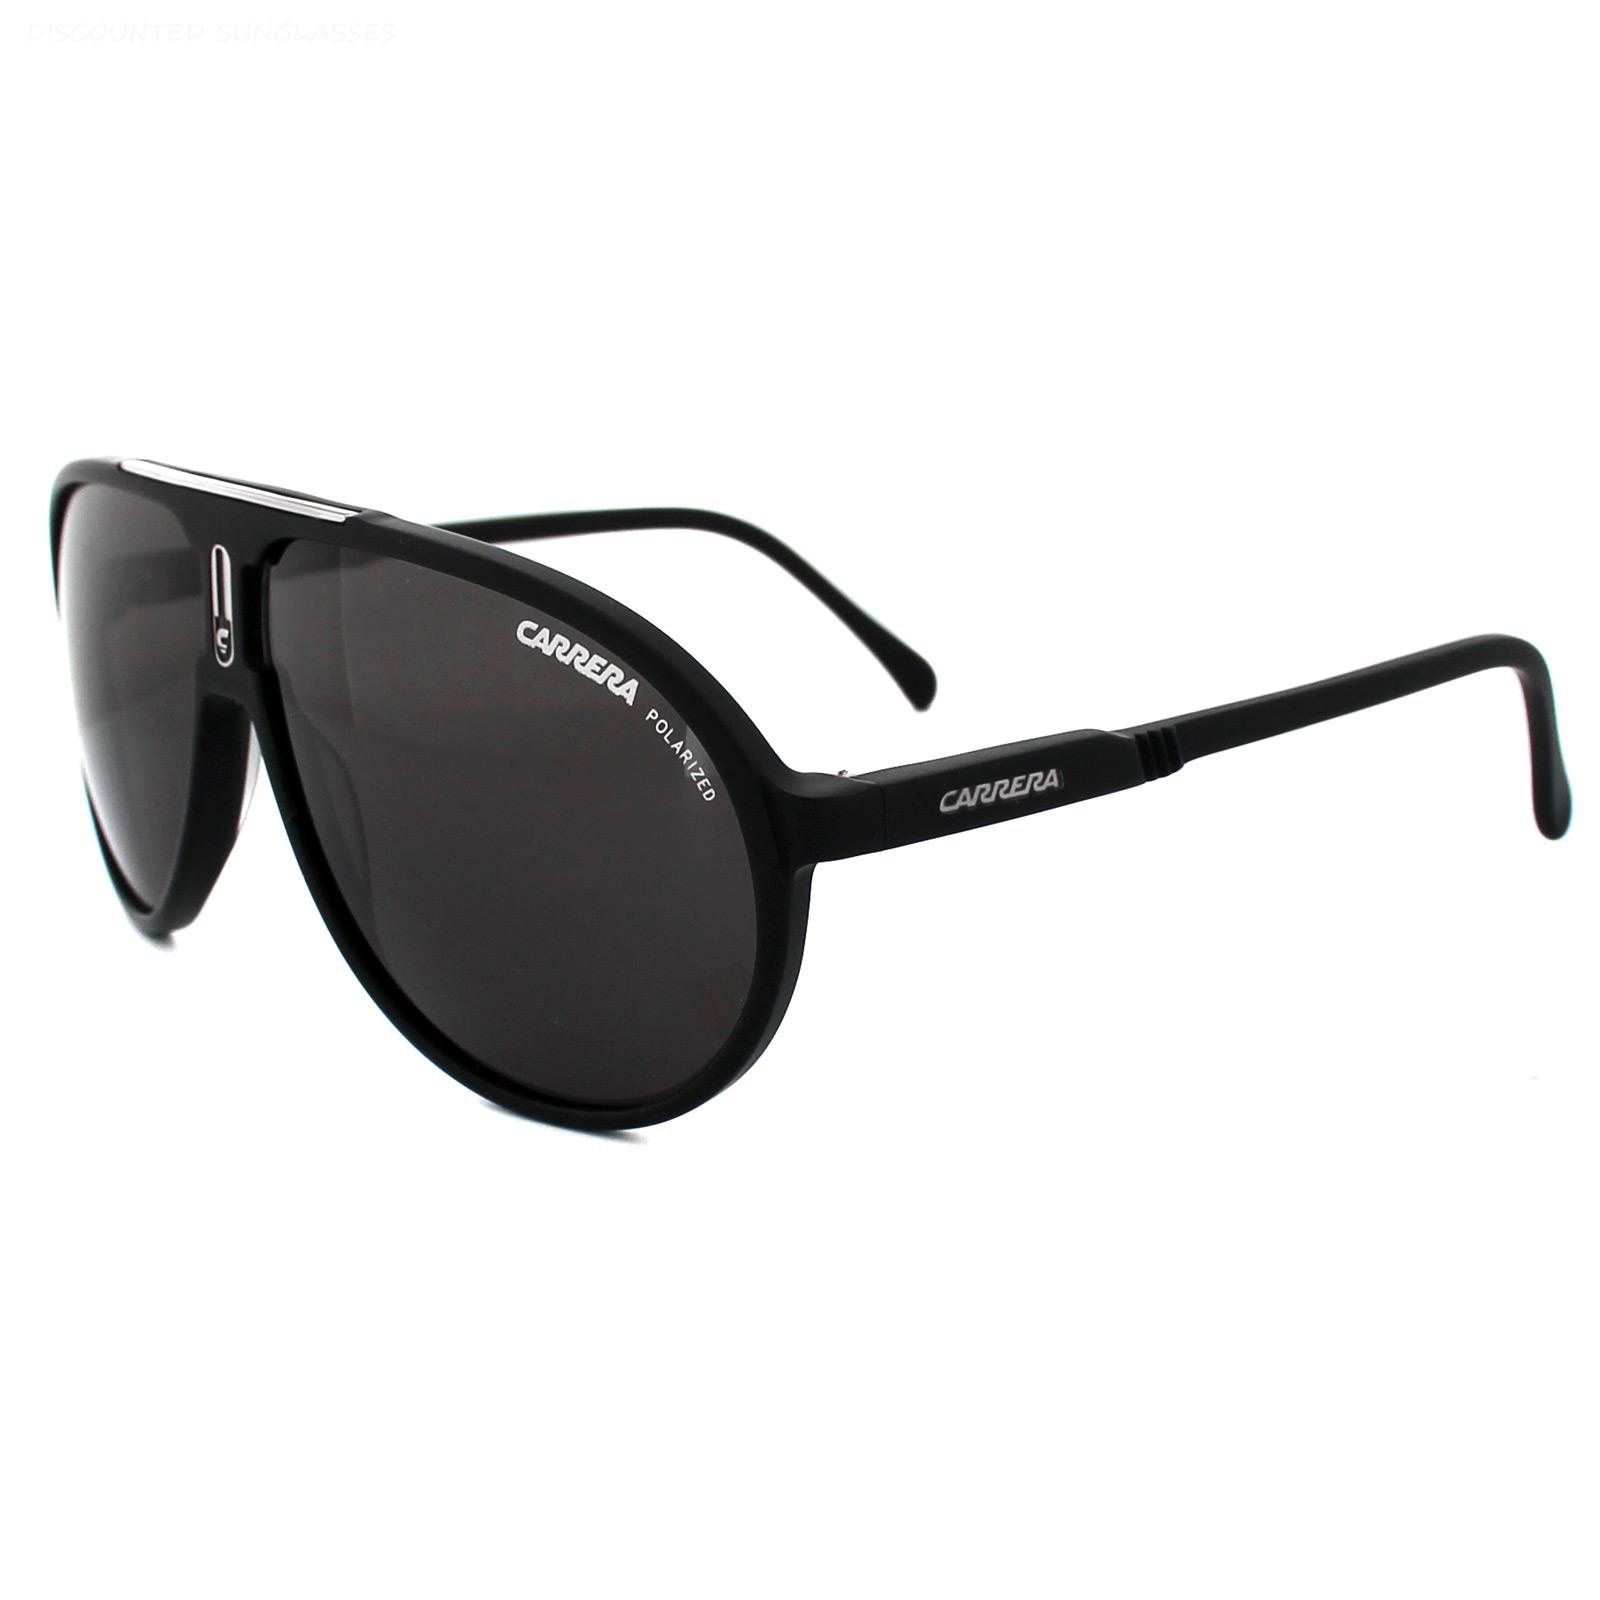 e7ecff1788 Carrera Sunglasses Champion  AC QHC M9 Matt Black Grey Polarized Thumbnail  1 ...